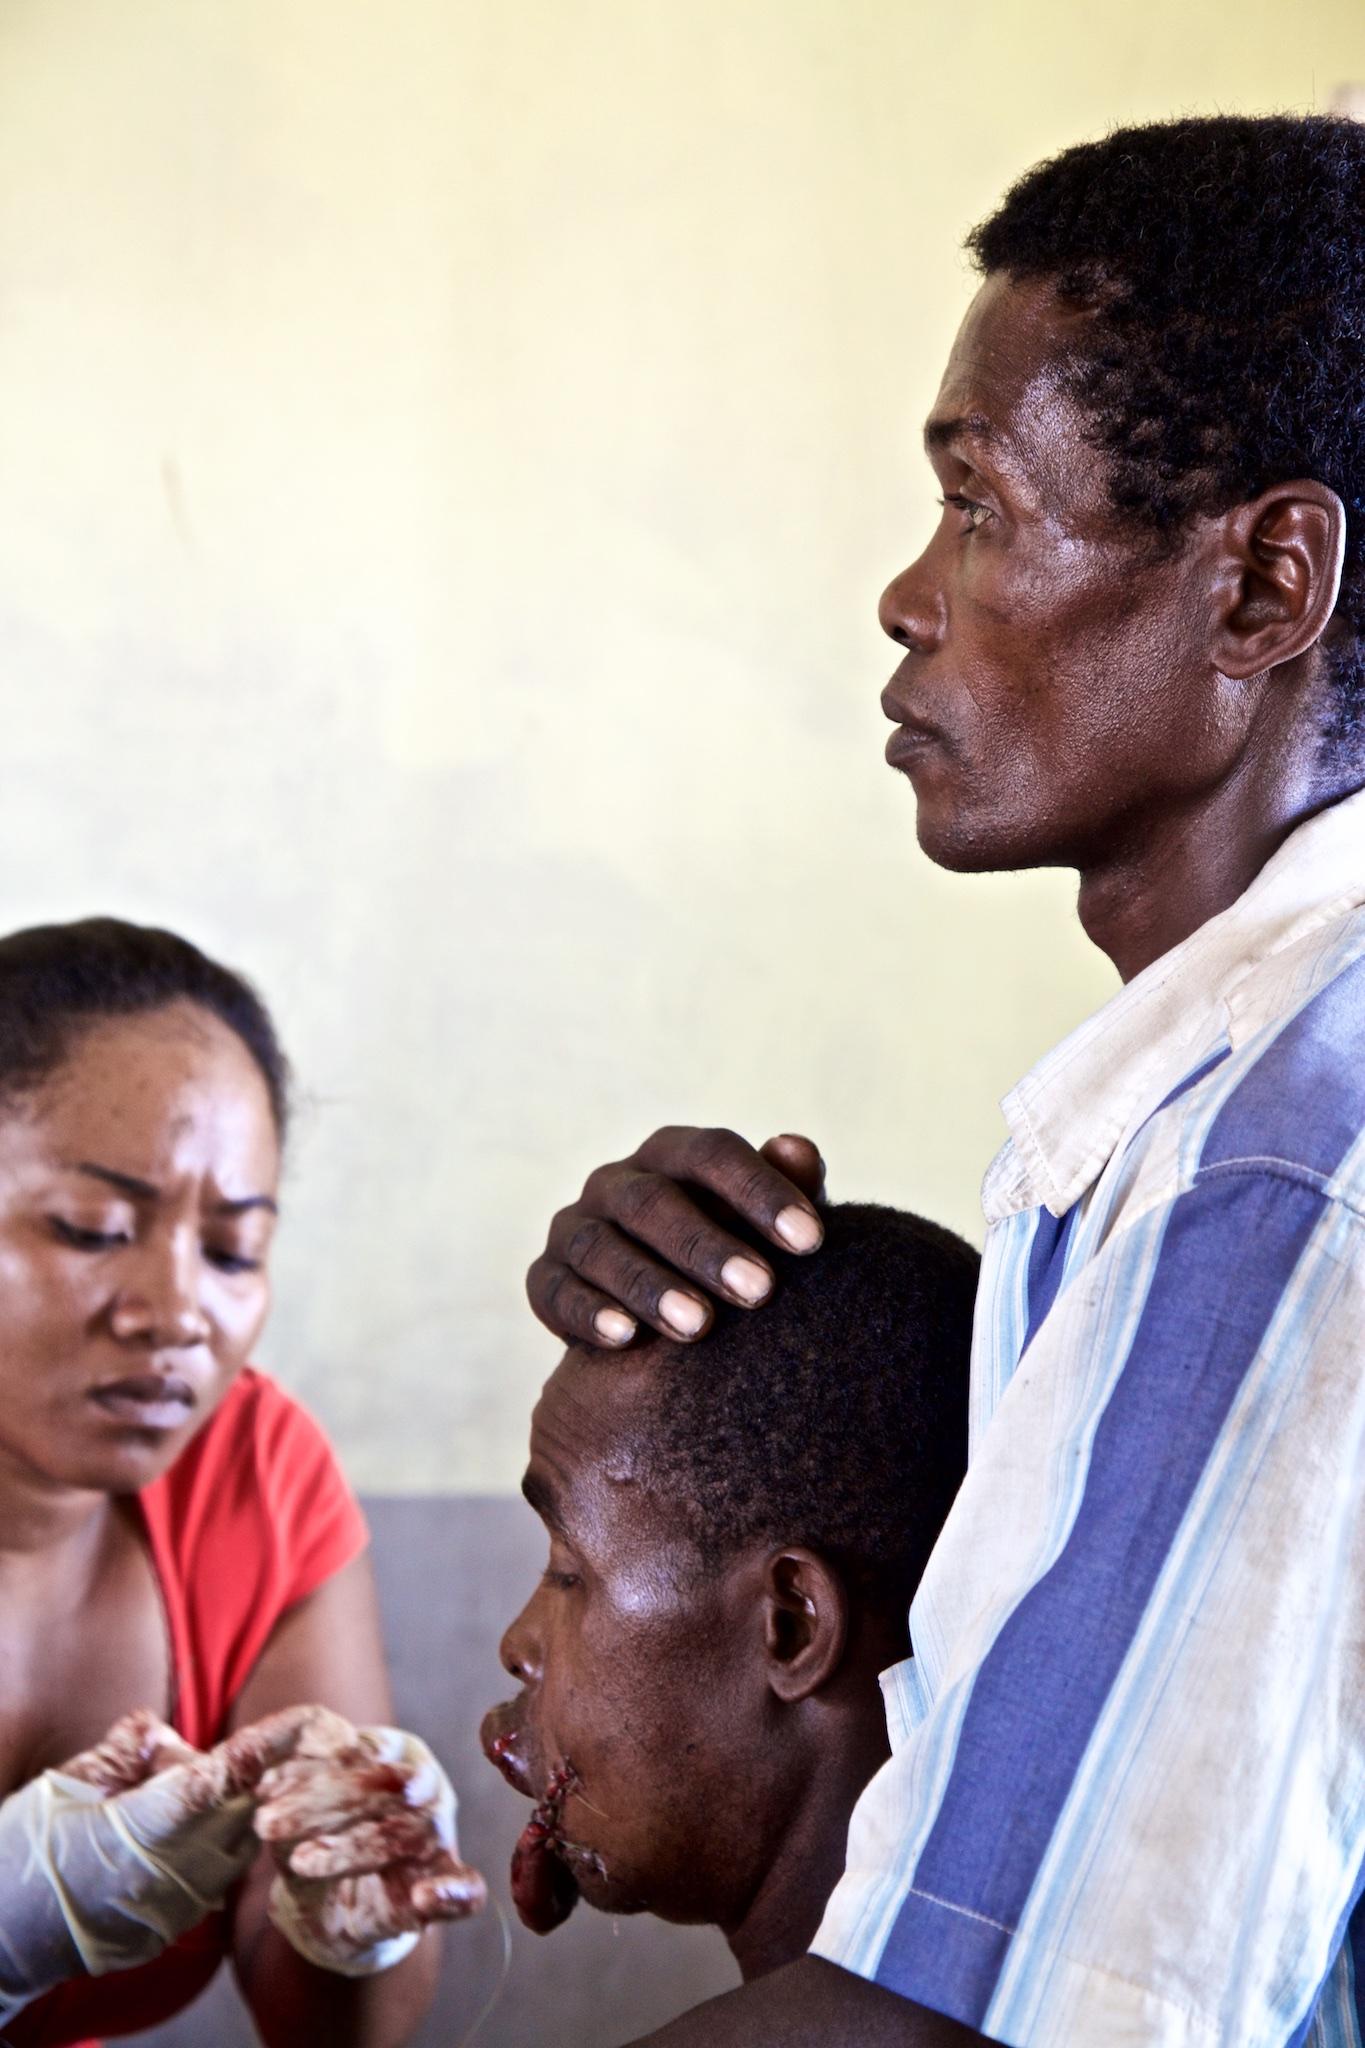 Madagacar's Regional Nurses